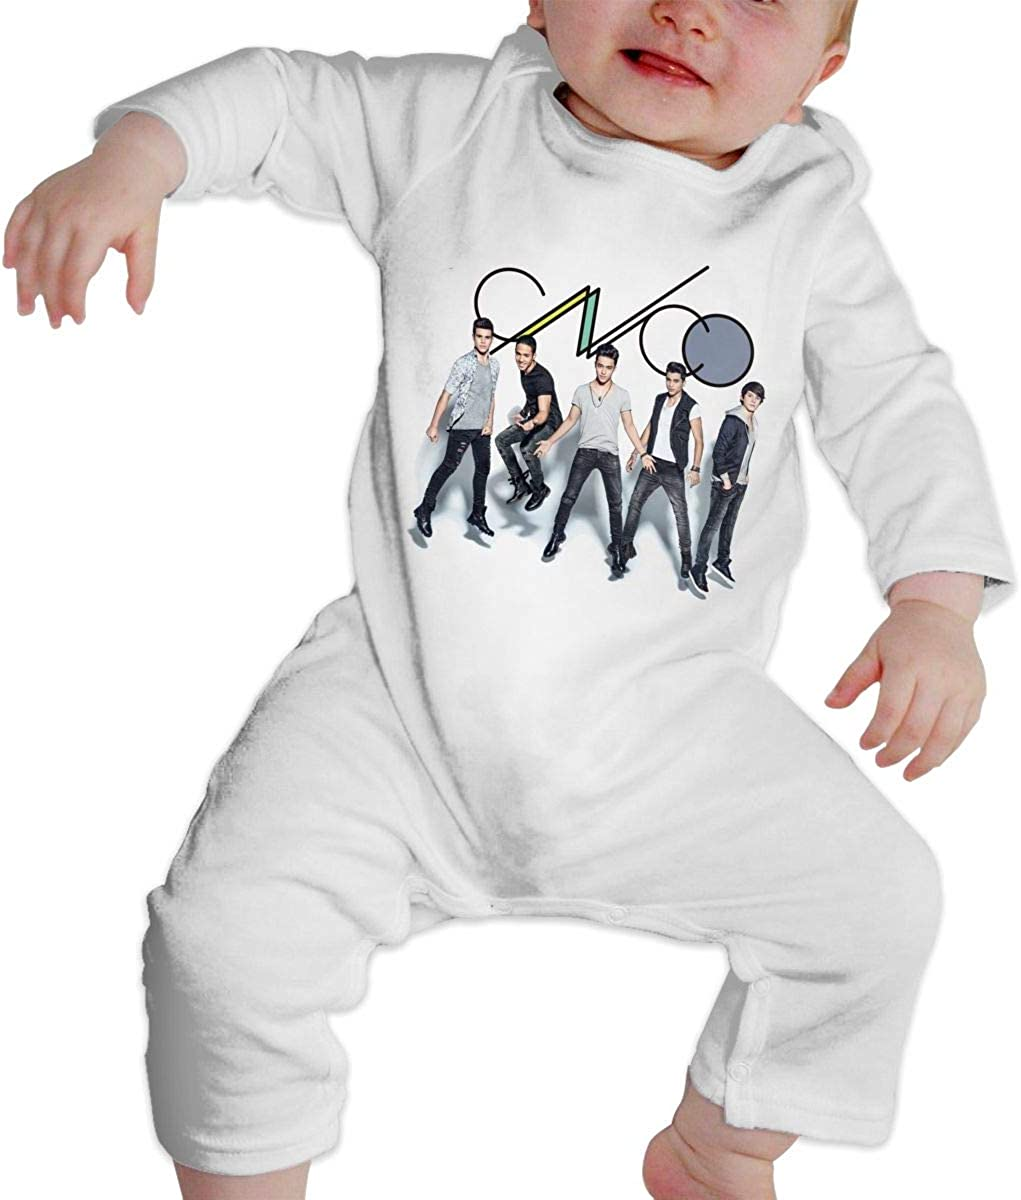 Qq1-asd-store CNCO Boys//Girls Baby Cotton Long Sleeve Romper Warm Bodysuit